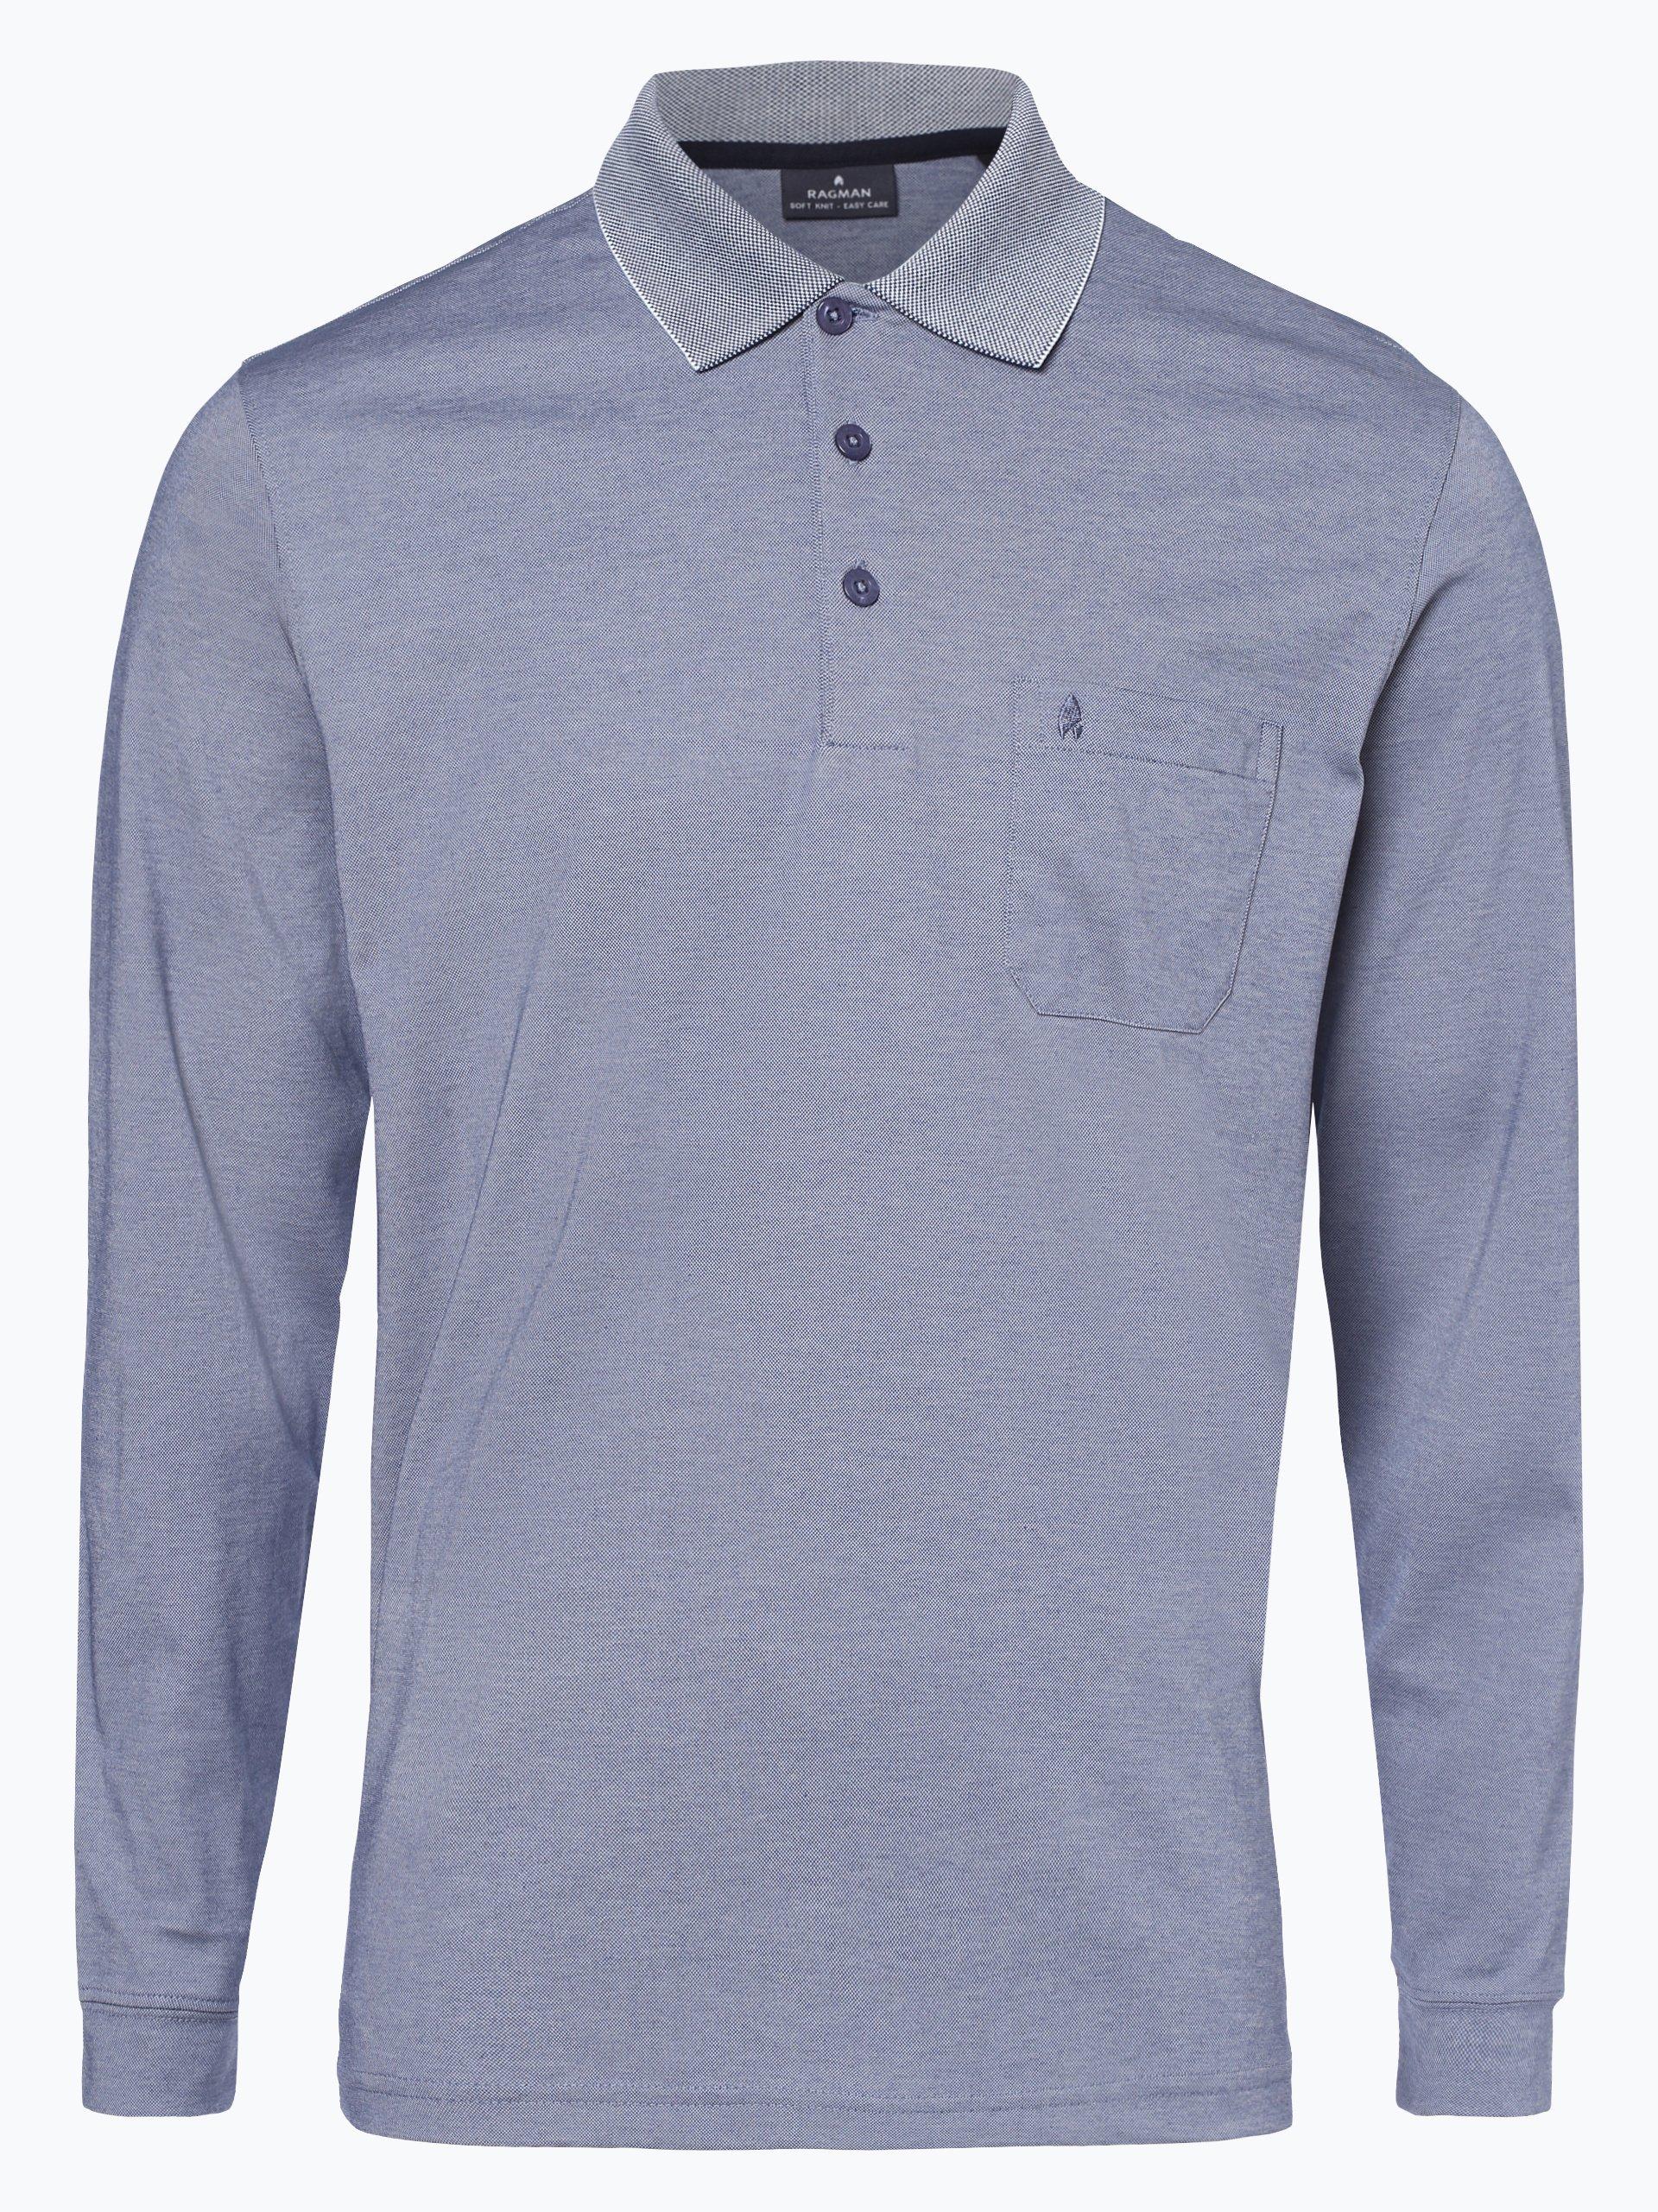 Ragman Herren Poloshirt